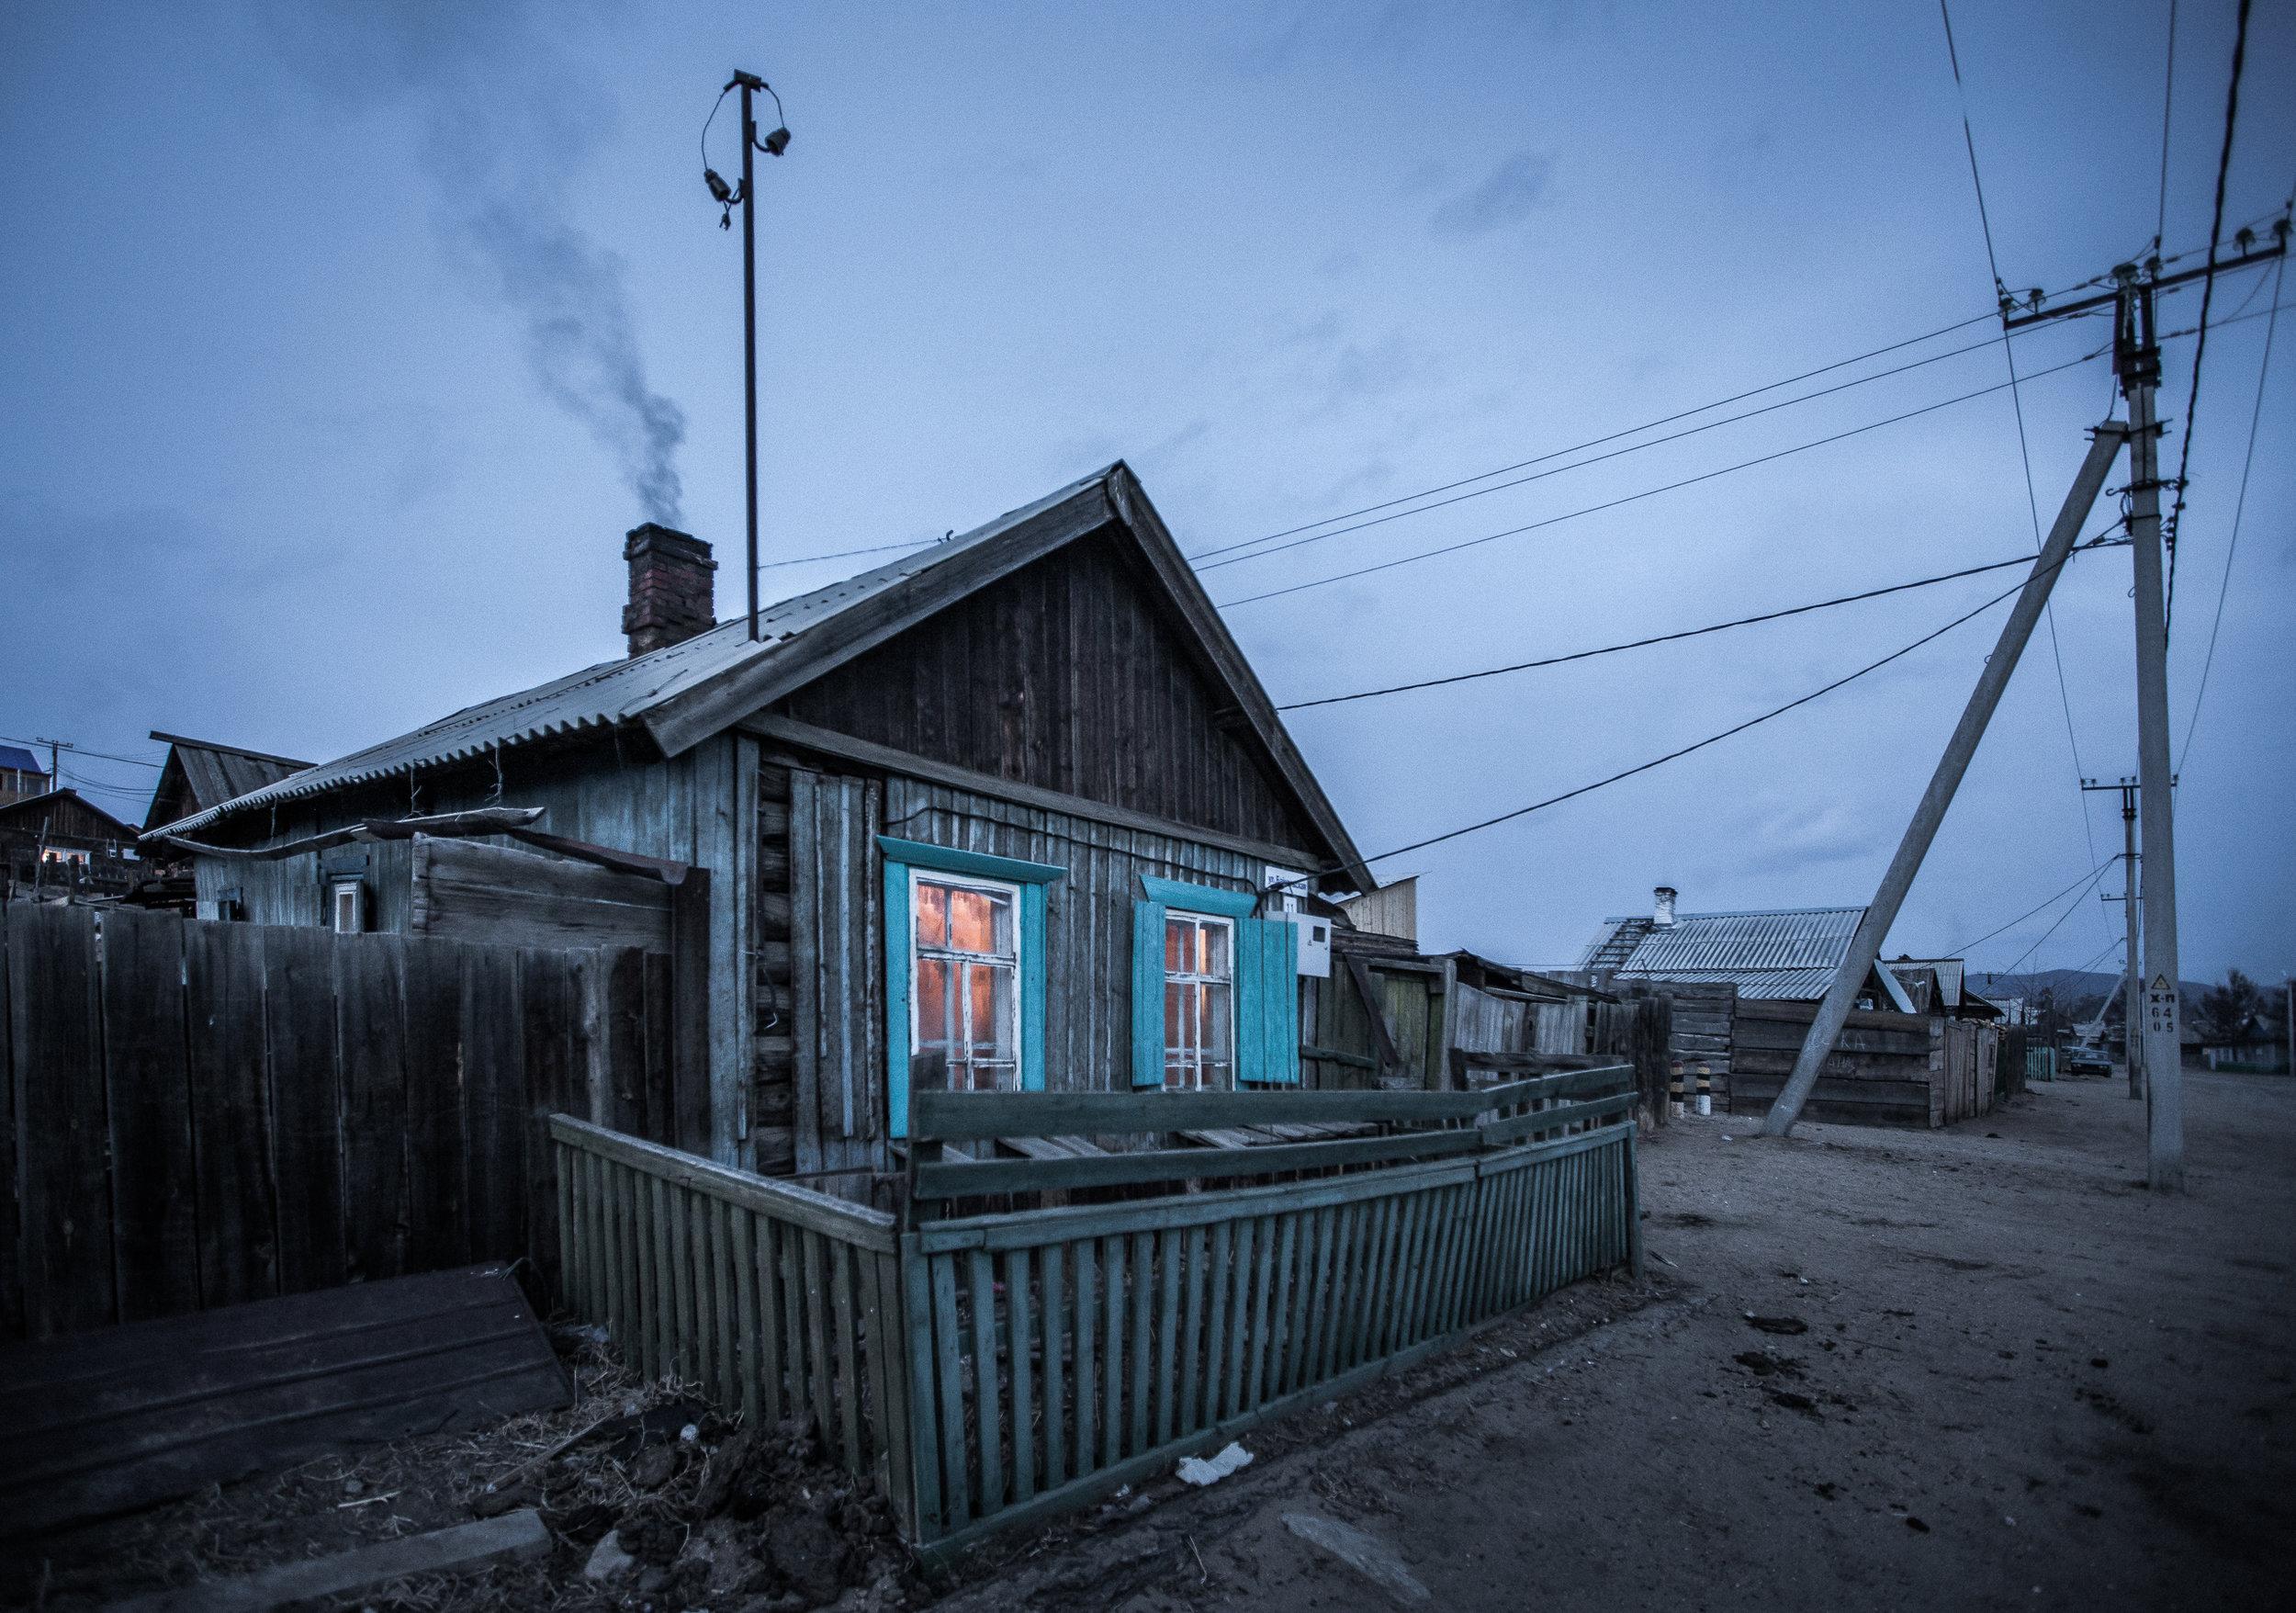 Gaudenz Danuser, Olchon Baikal Russia DAG0944_0312.jpg